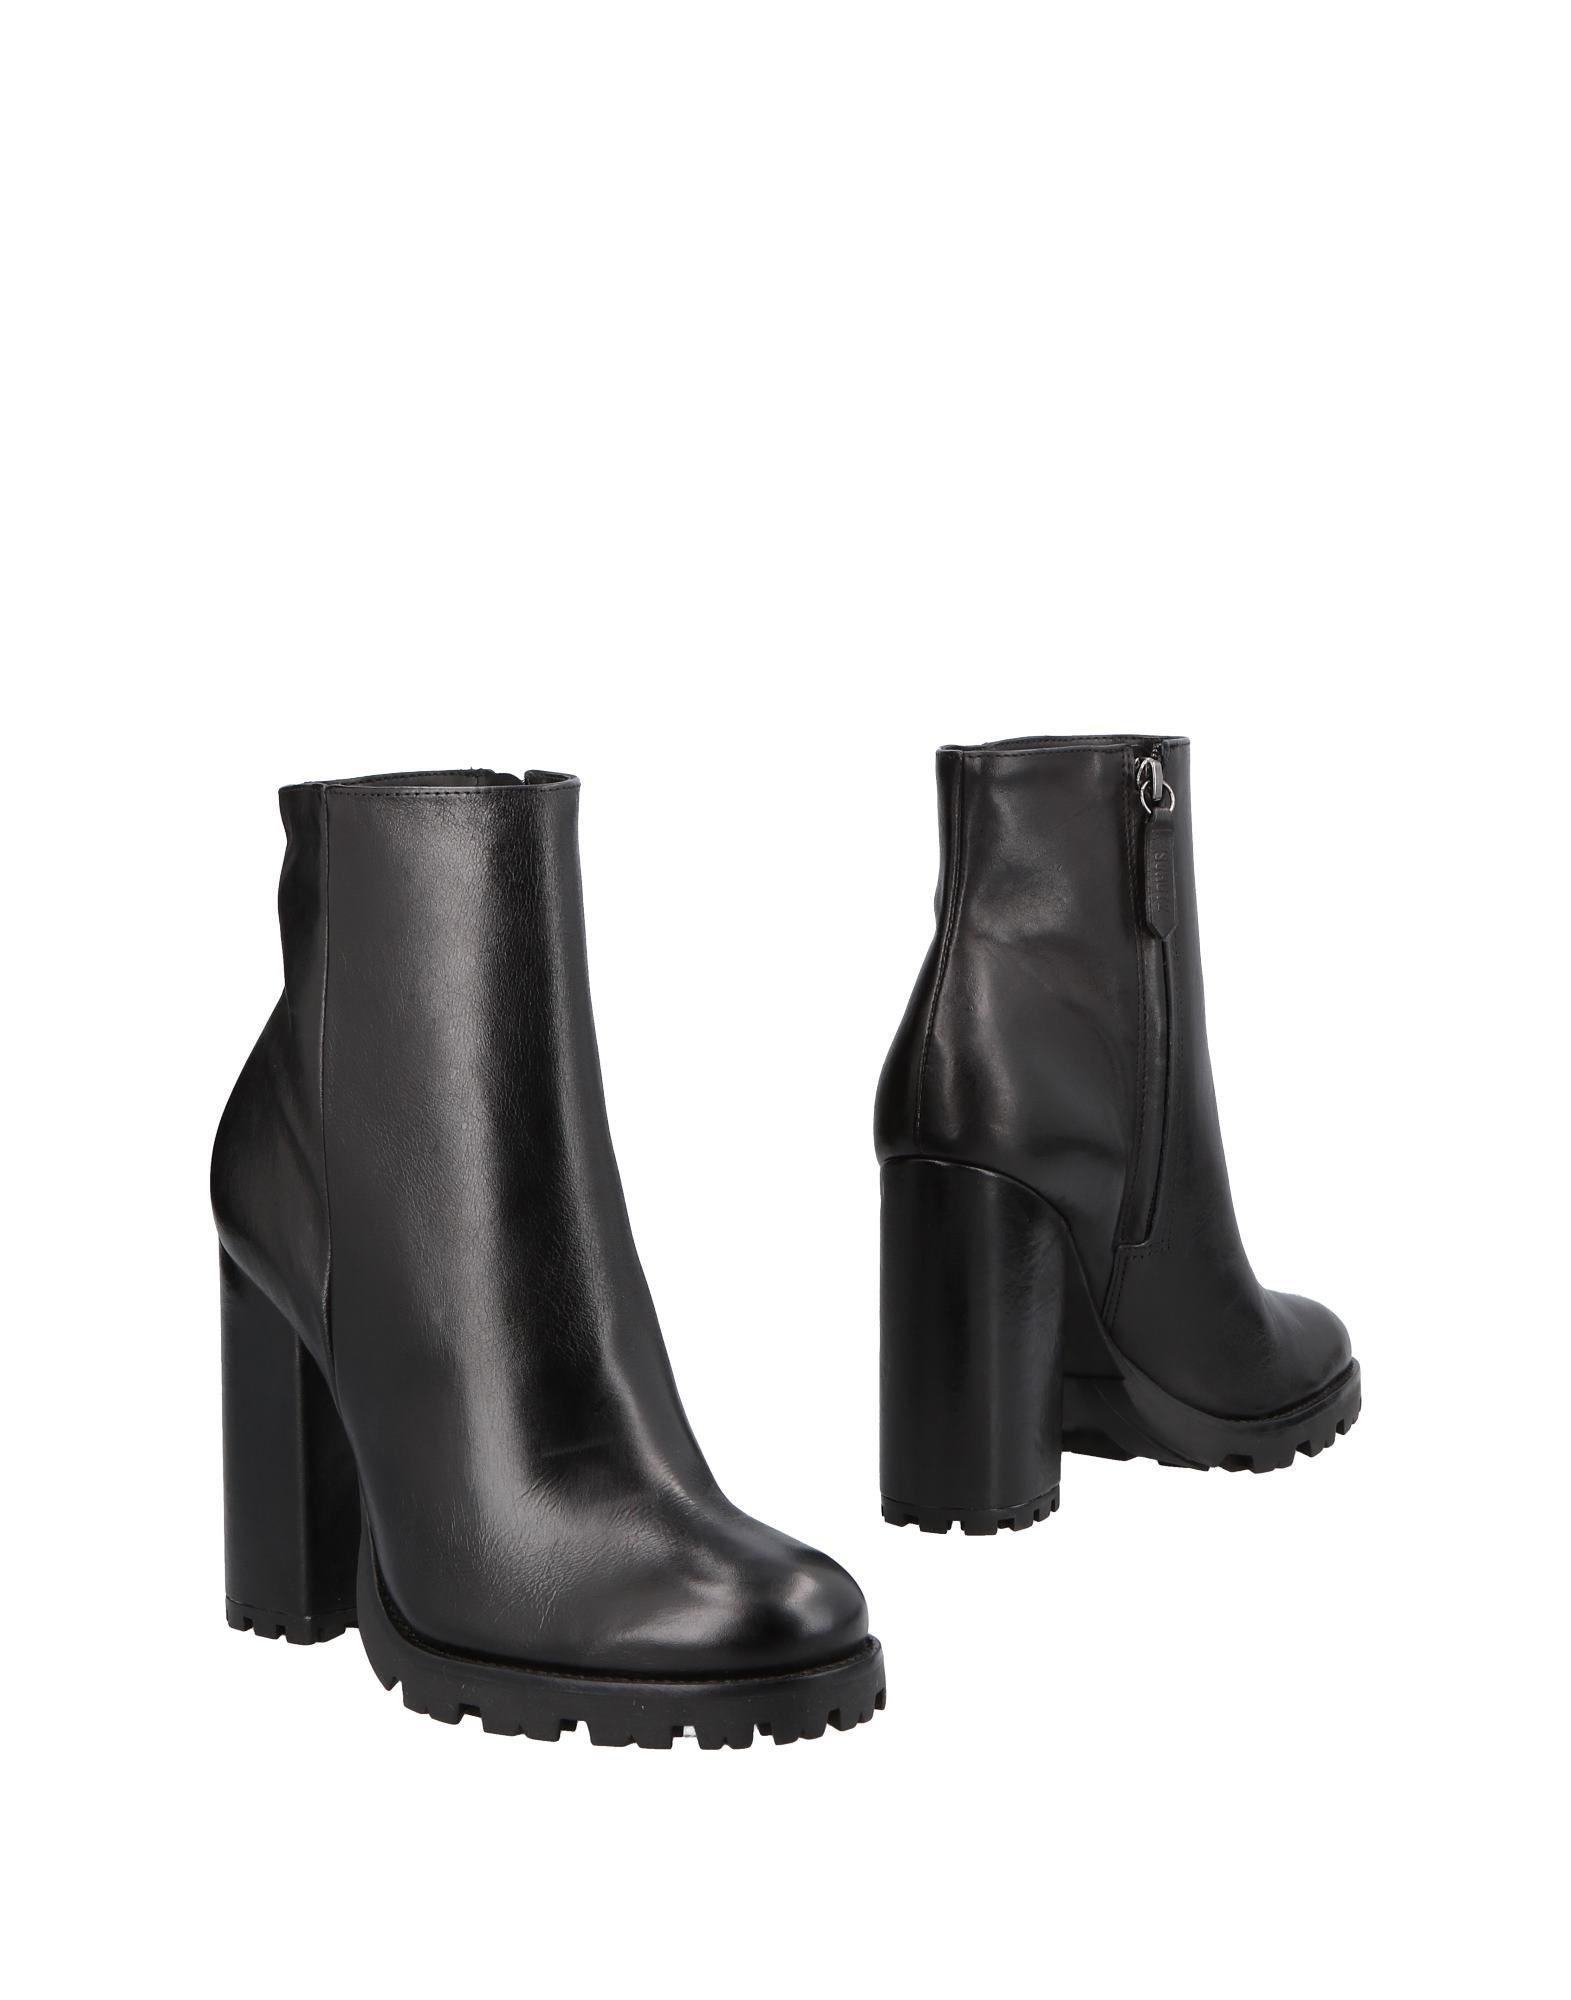 Schutz Ankle Boot - Women Schutz Ankle Boots online 11481804TP on  Australia - 11481804TP online 567803